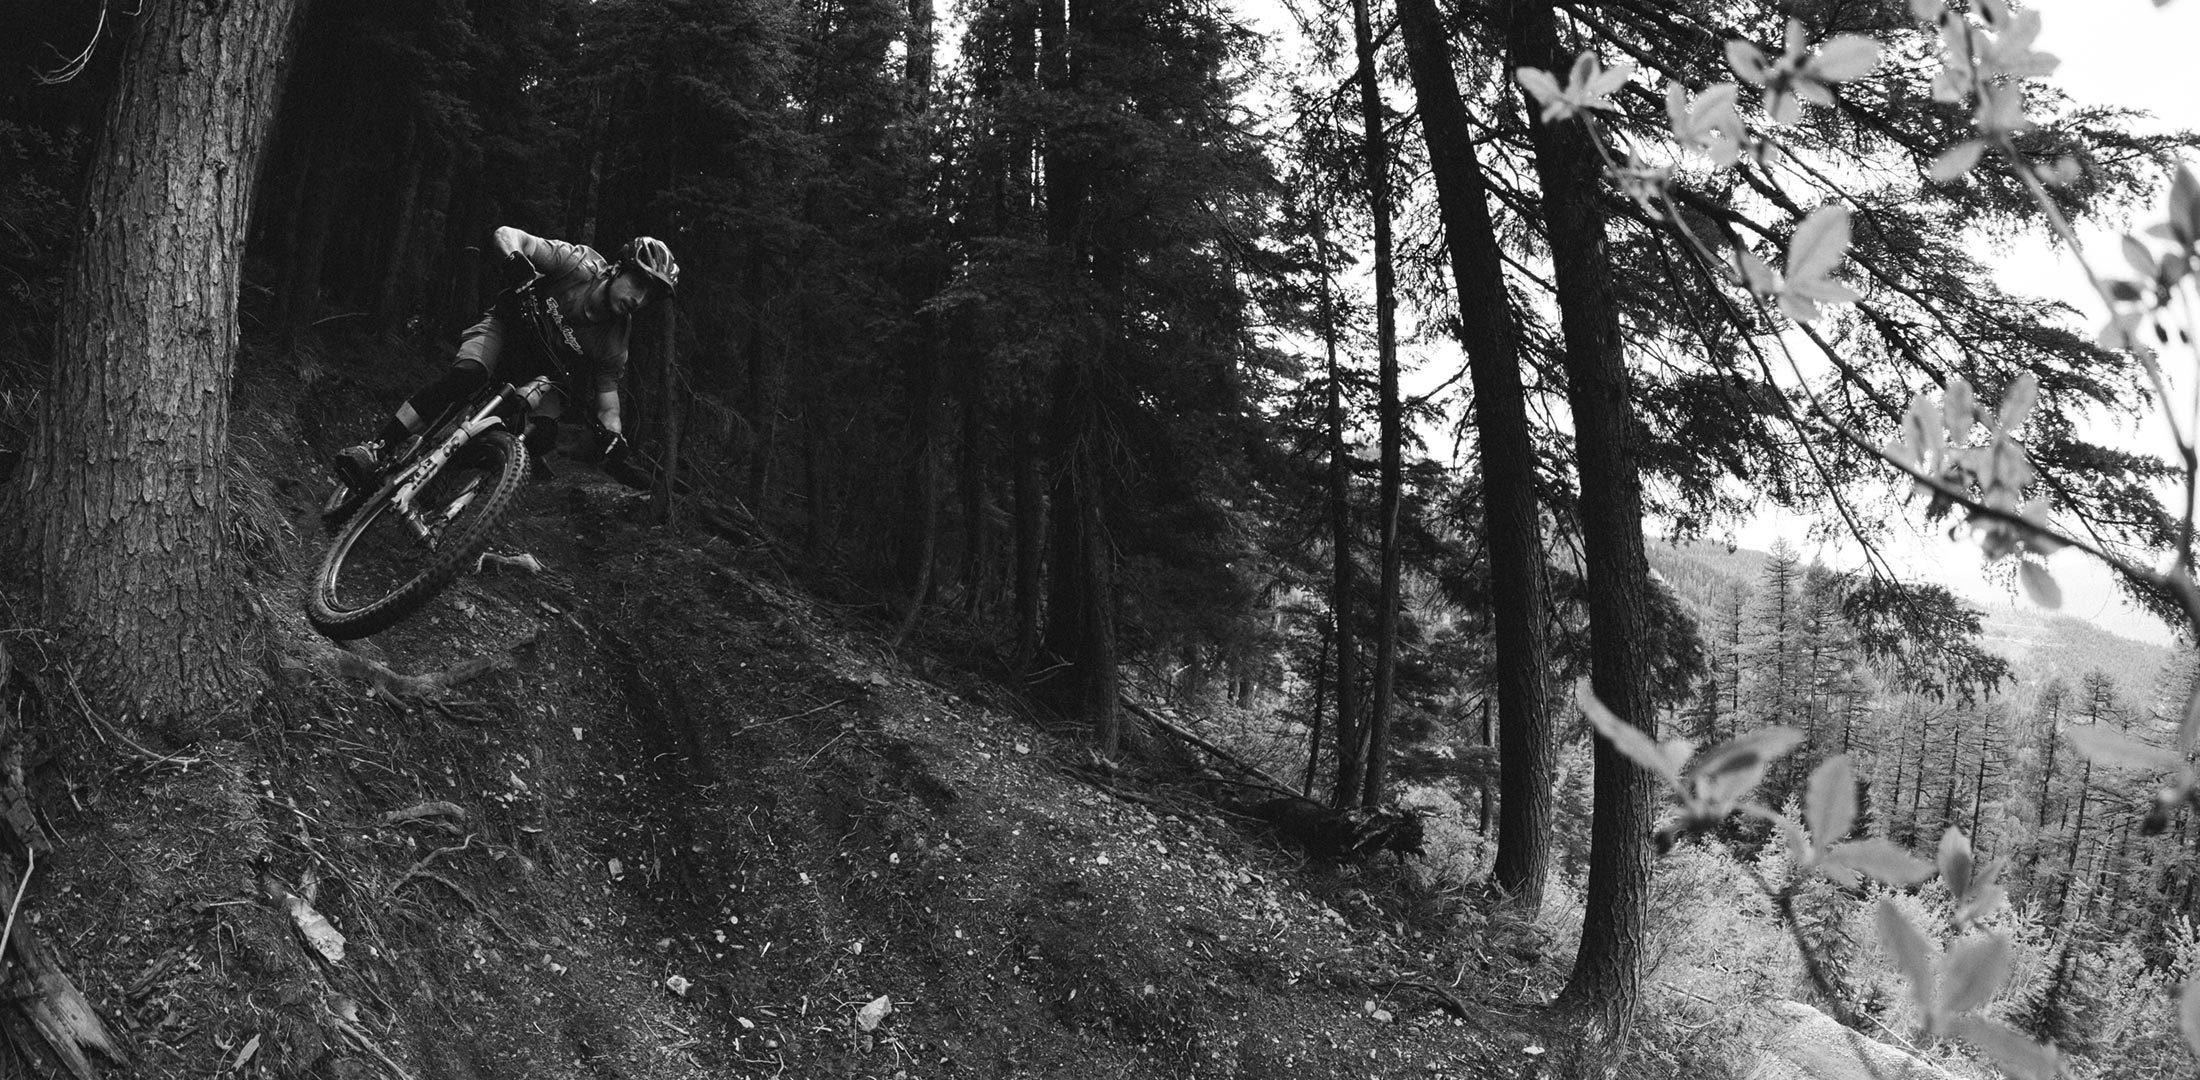 Evil Following MB Actionfoto schwarz weiß im Wald